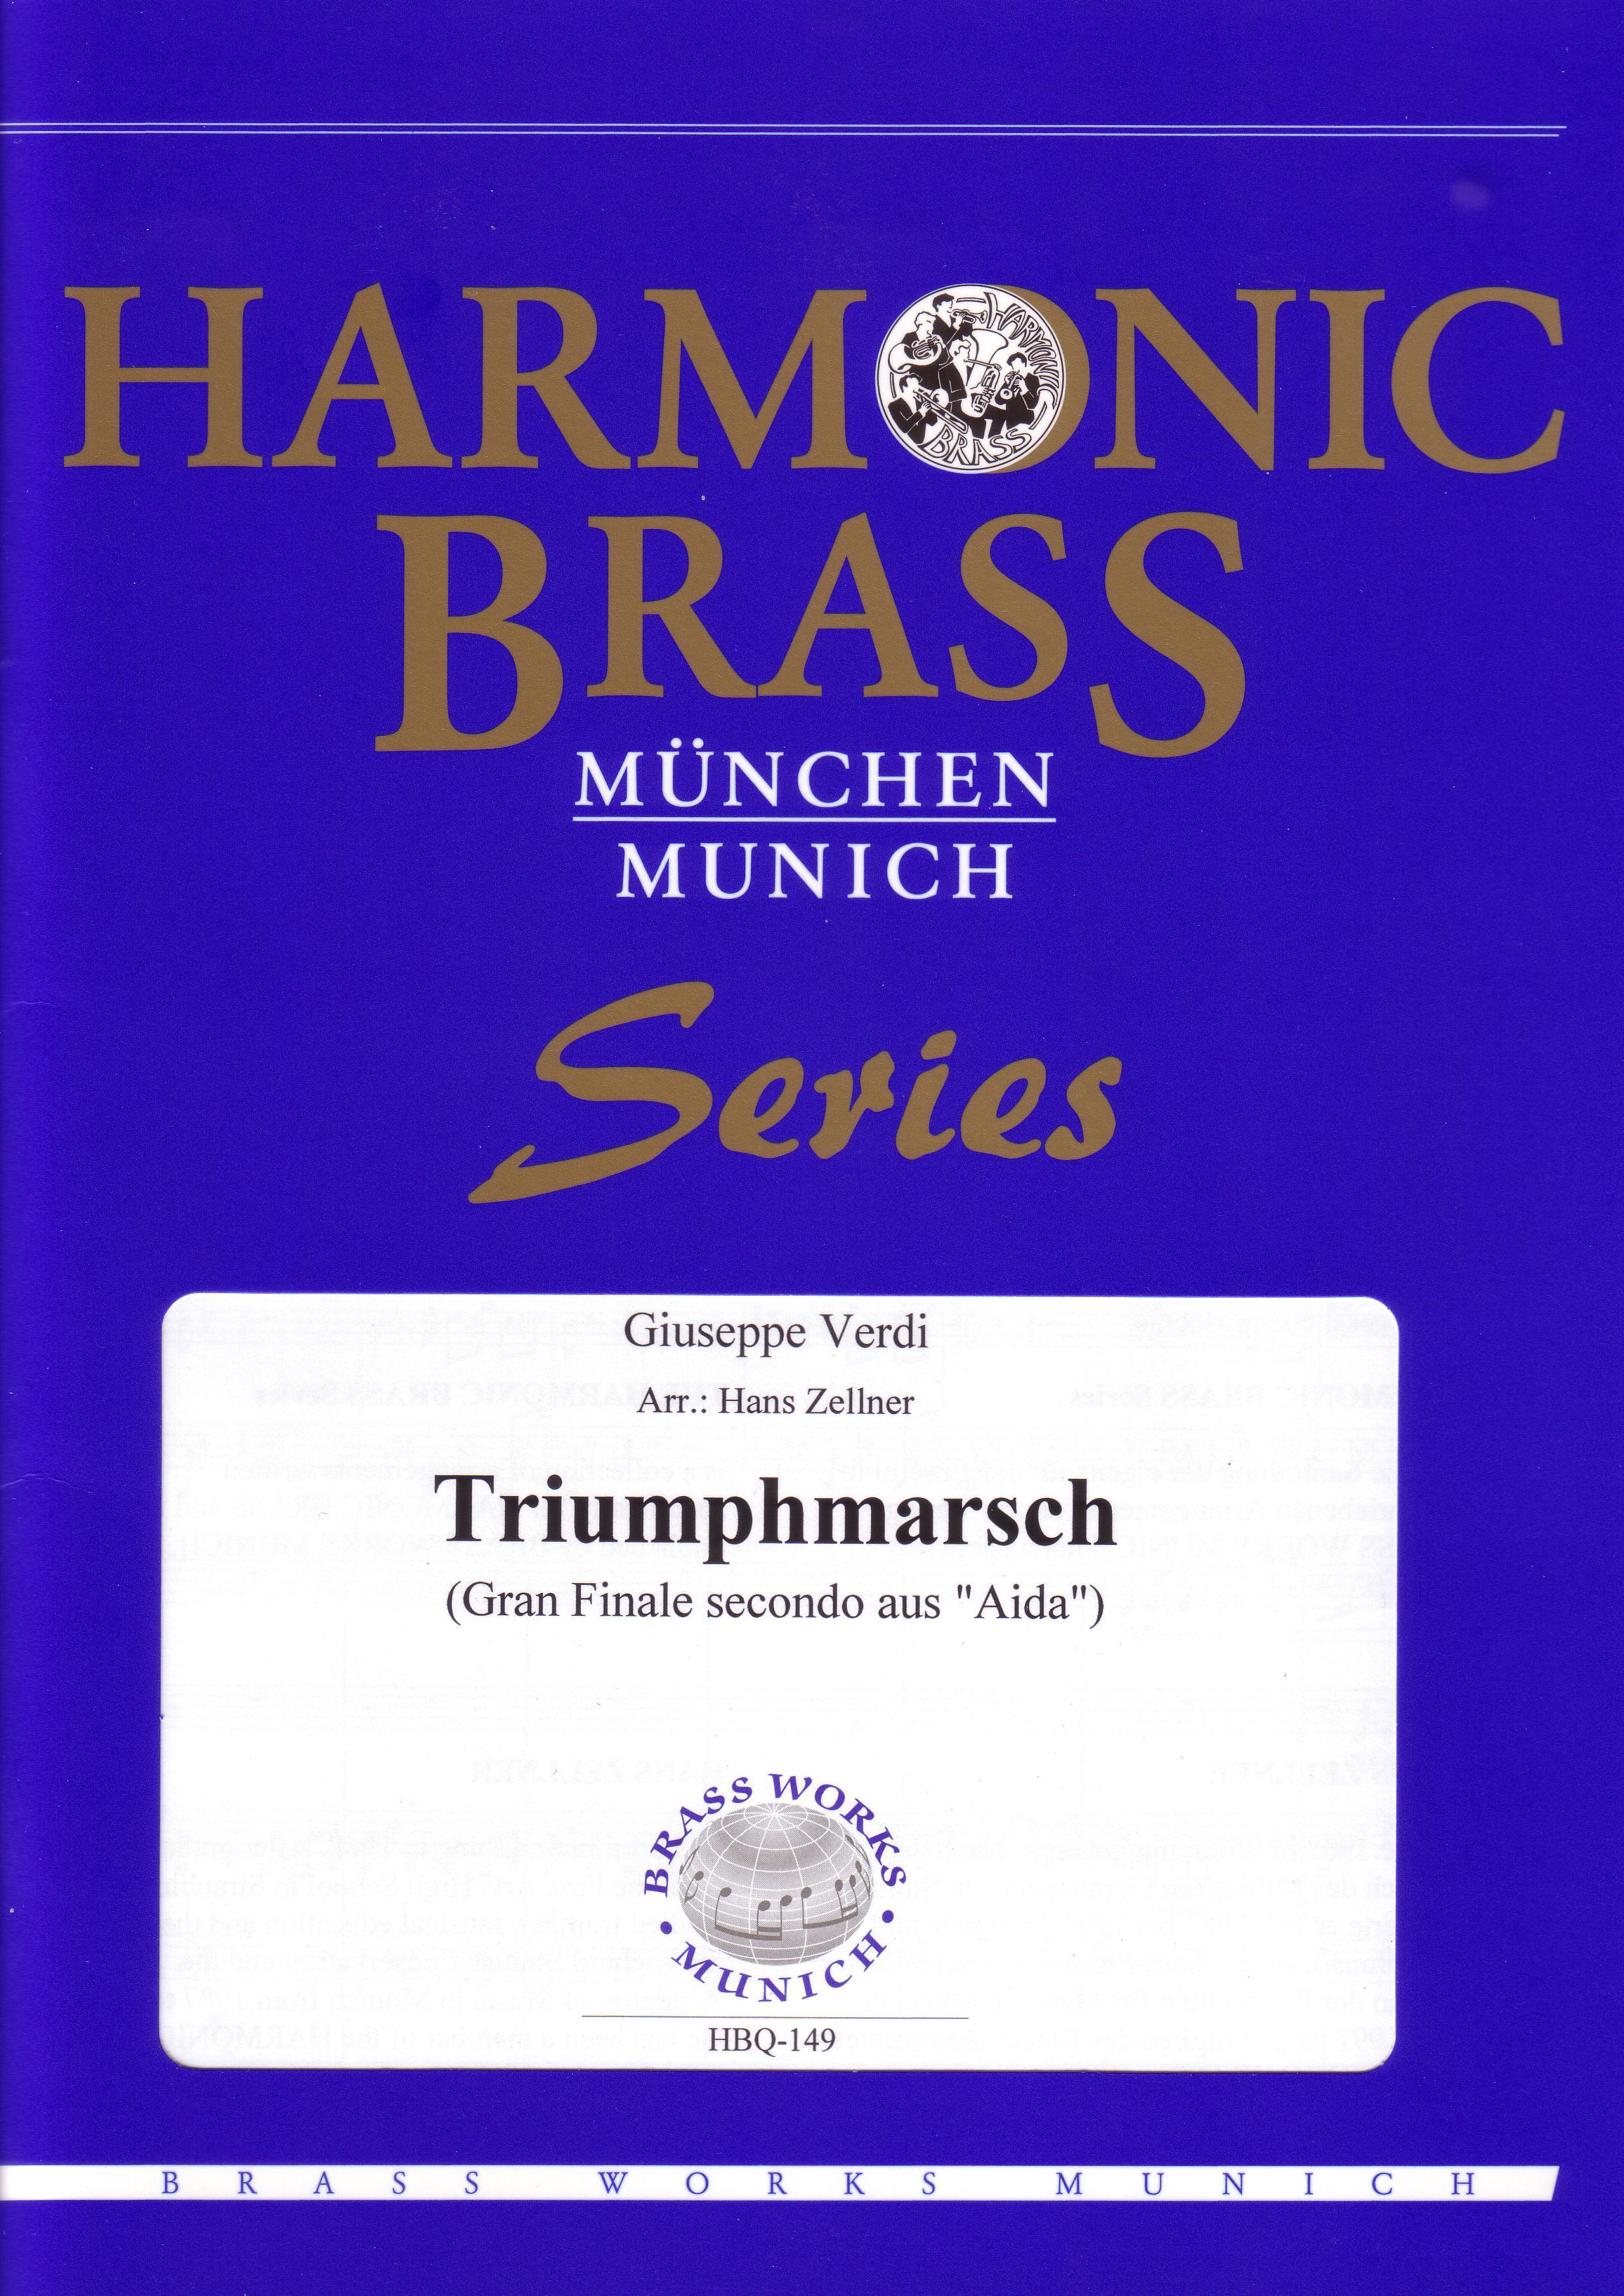 GRAND MARCH (Triumphmarsch) from Aida score & parts